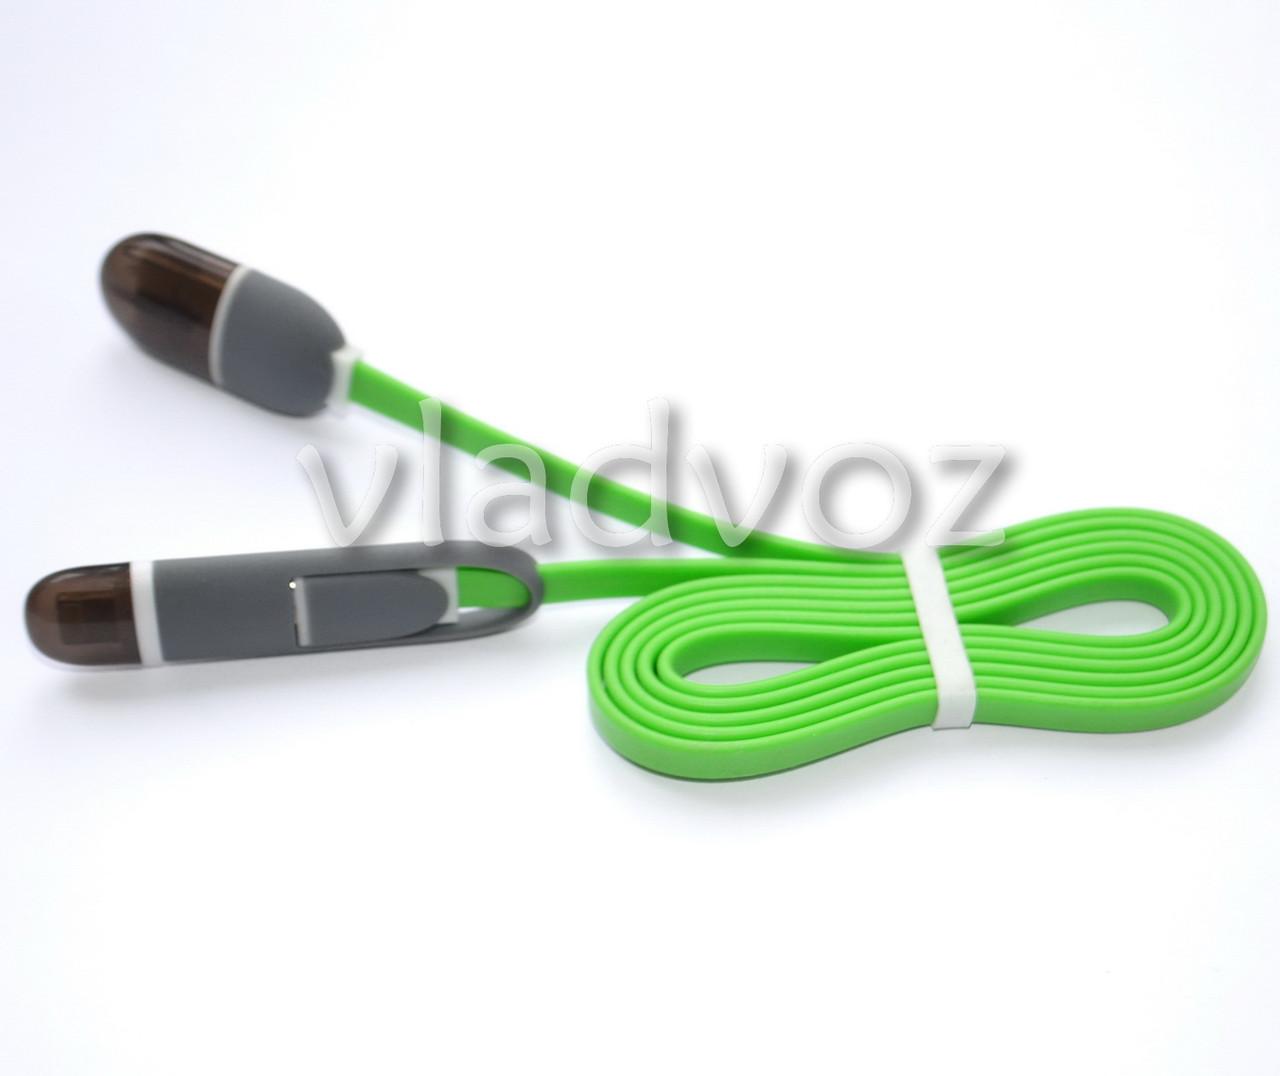 Кабель micro usb iphone 5 5g 5c 5s iPad Mini 2в1 зелёный